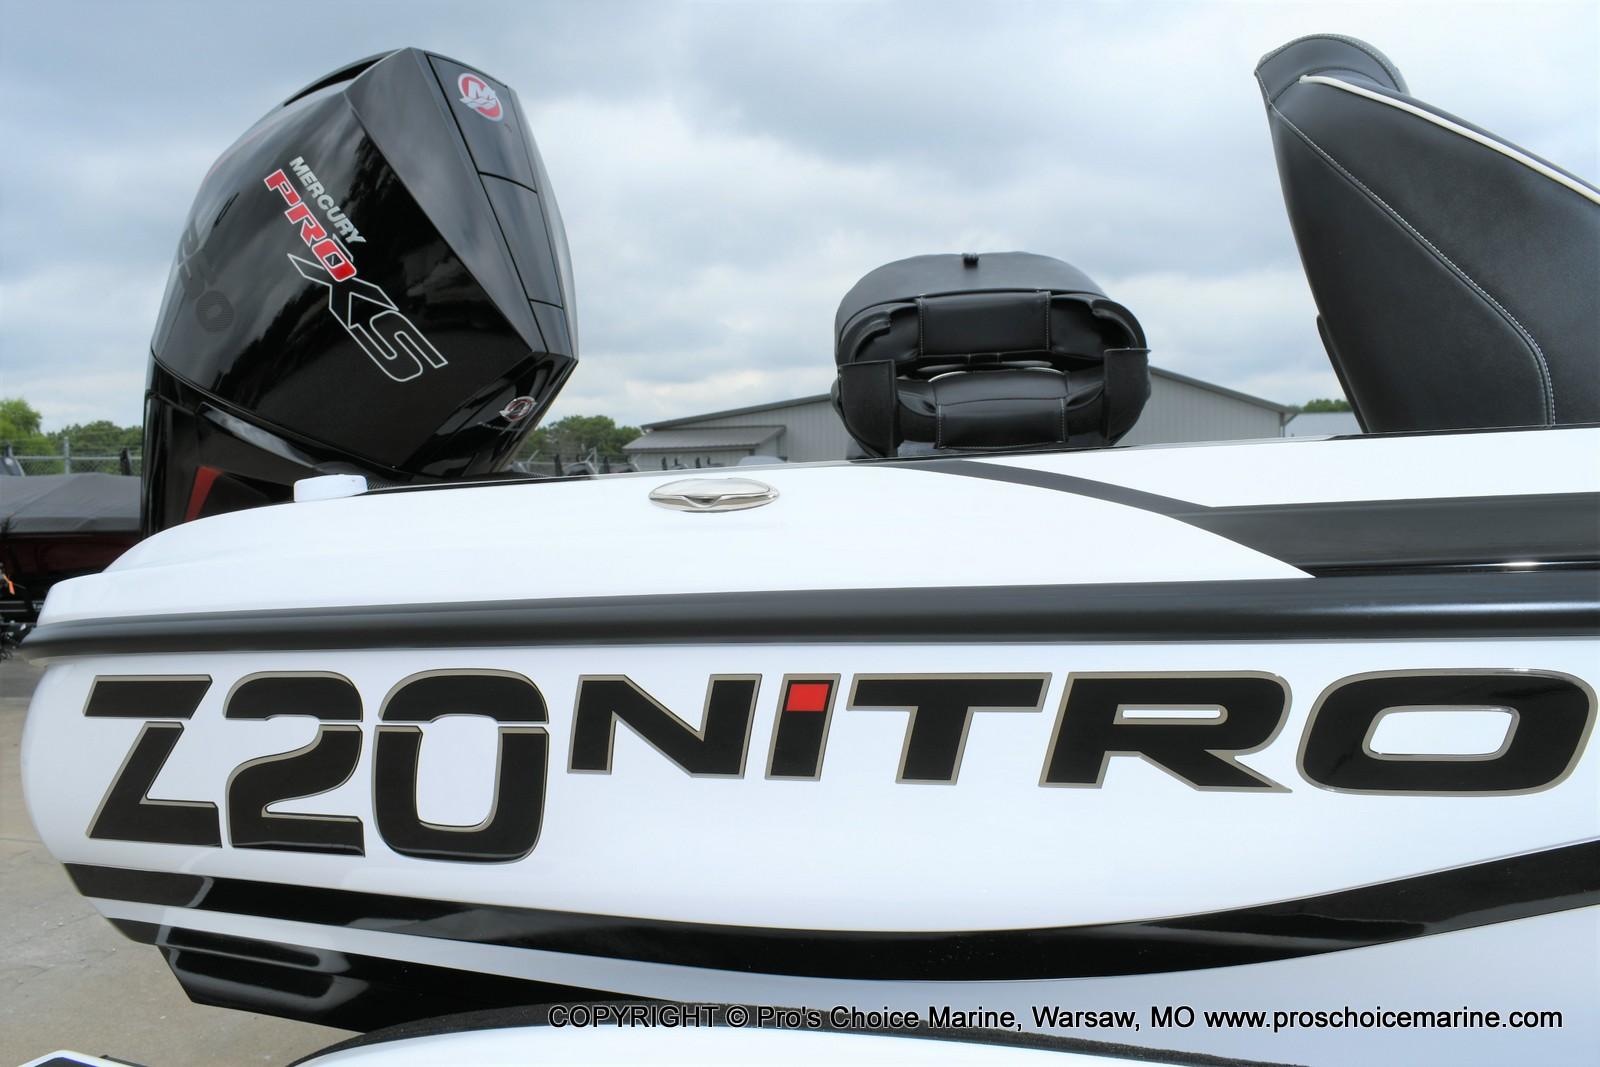 2020 Nitro Nitro Z20 for sale in Warsaw, MO   Pro's Choice Marine